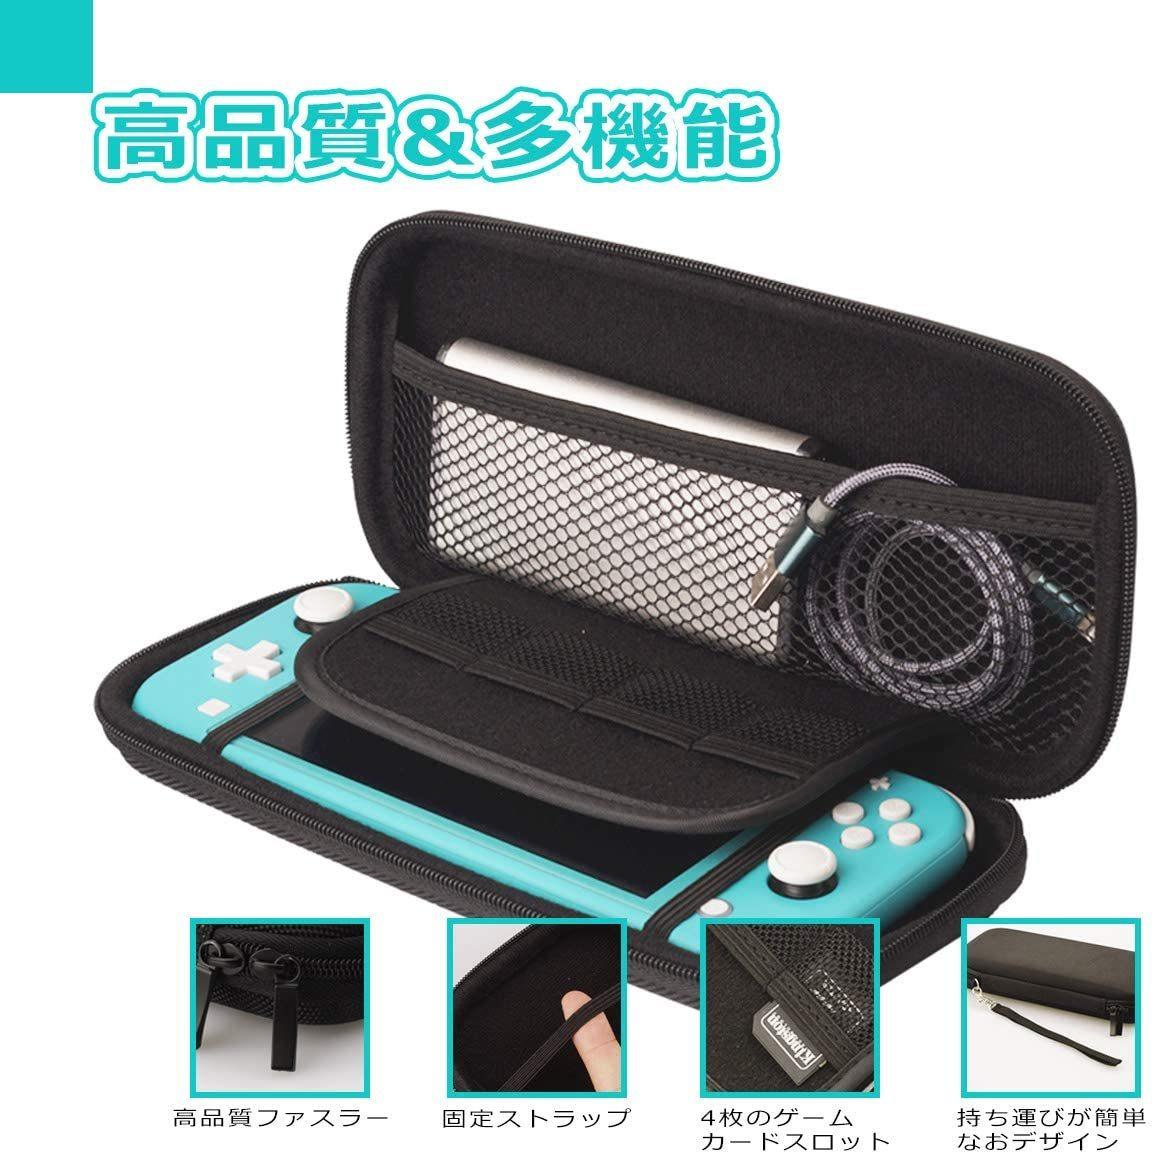 Nintendo Switch Lite ケース 薄型 持ち運び便利 耐衝撃 防塵 防汚 撥水性 全面 保護ケース+Switch Lite 保護フィルム#A82